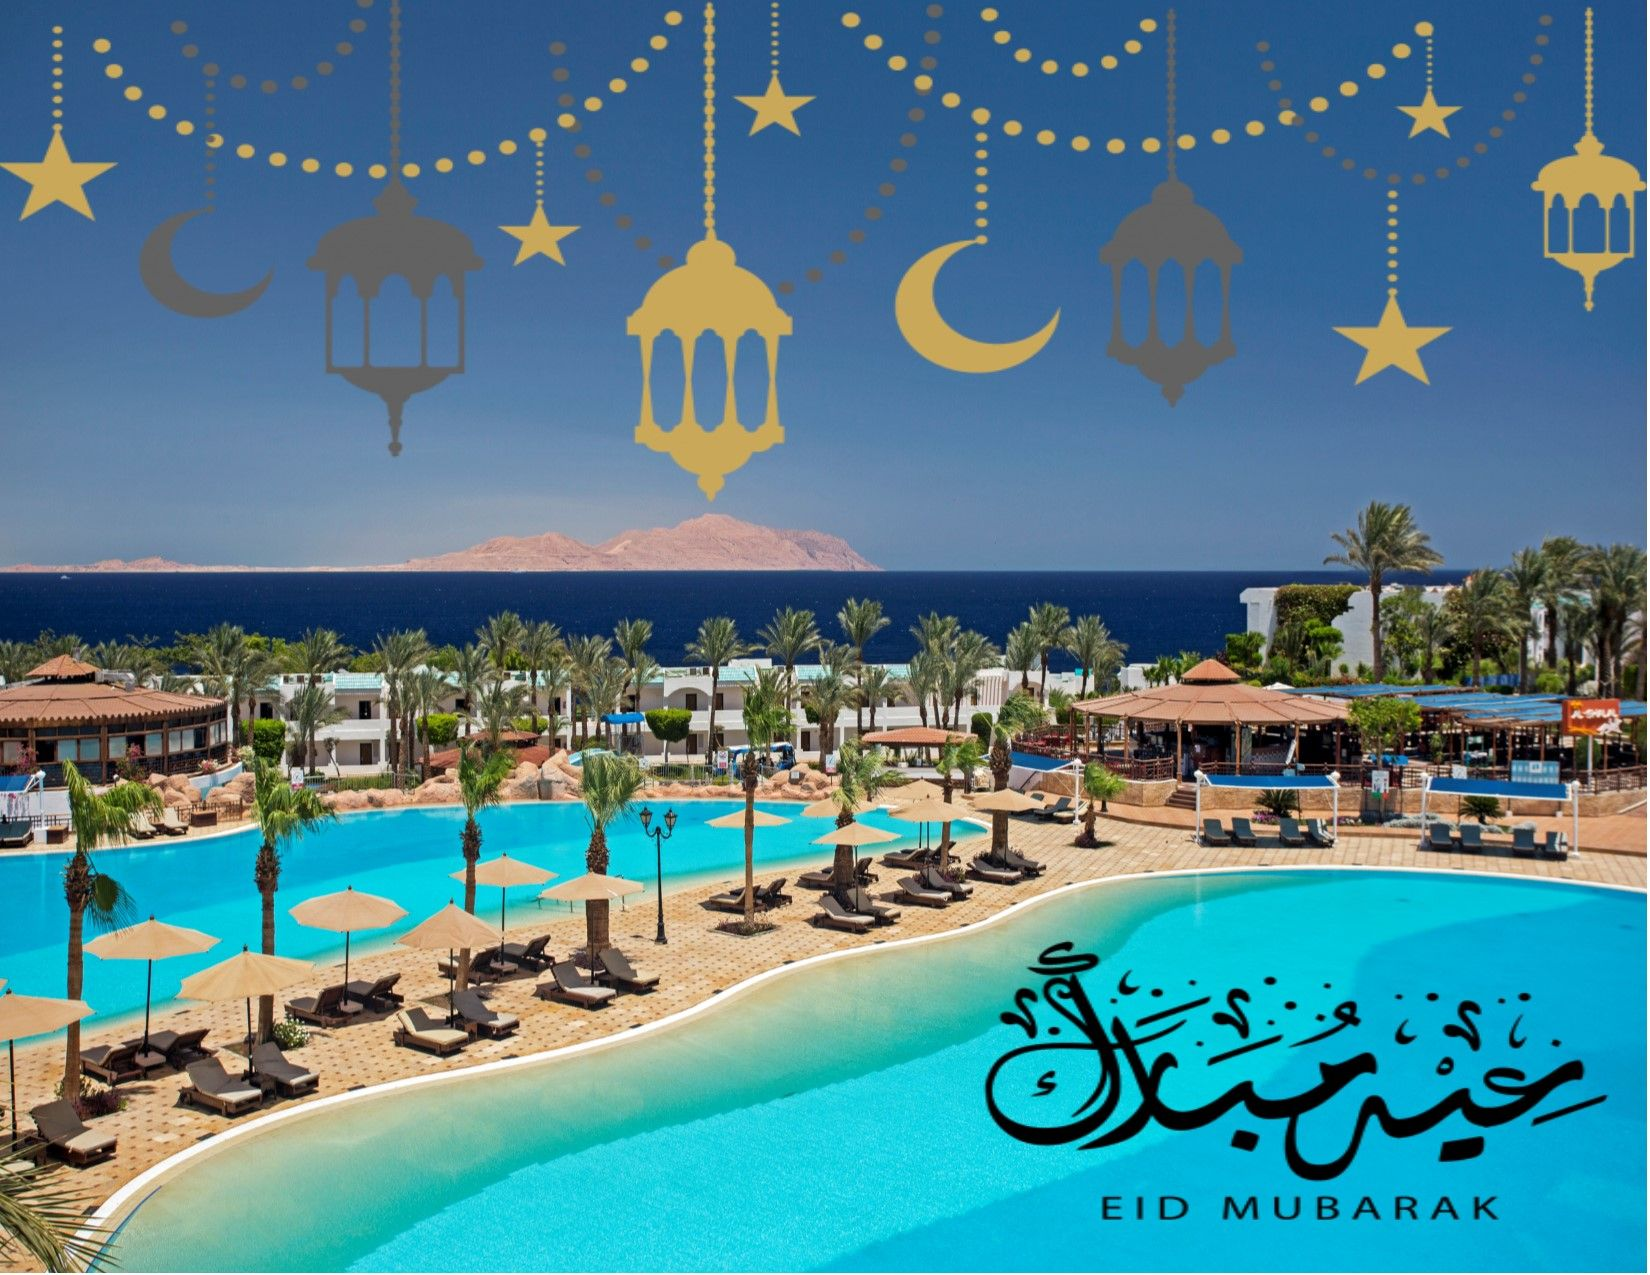 Eid Mubarak To Everyone From Sultan Gardens Family Sultangardens Wecareanditshows Egypt Sharmelsheikh Best All Inclusive Resorts Eid Mubarak Trip Advisor